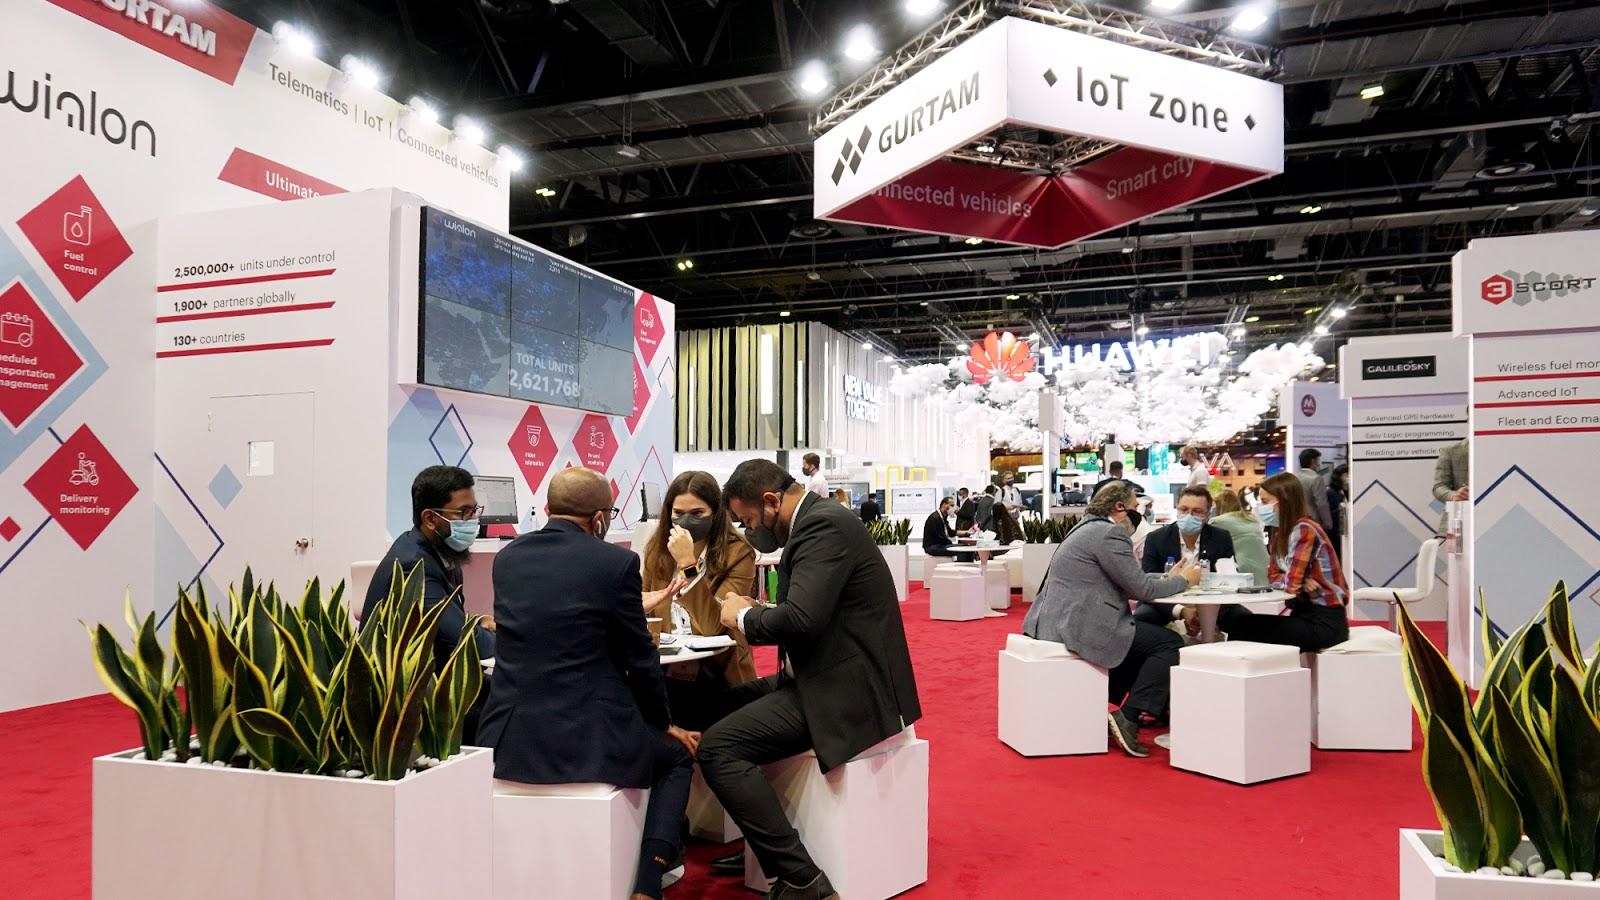 Gurtam IoT-zone at GITEX 2020